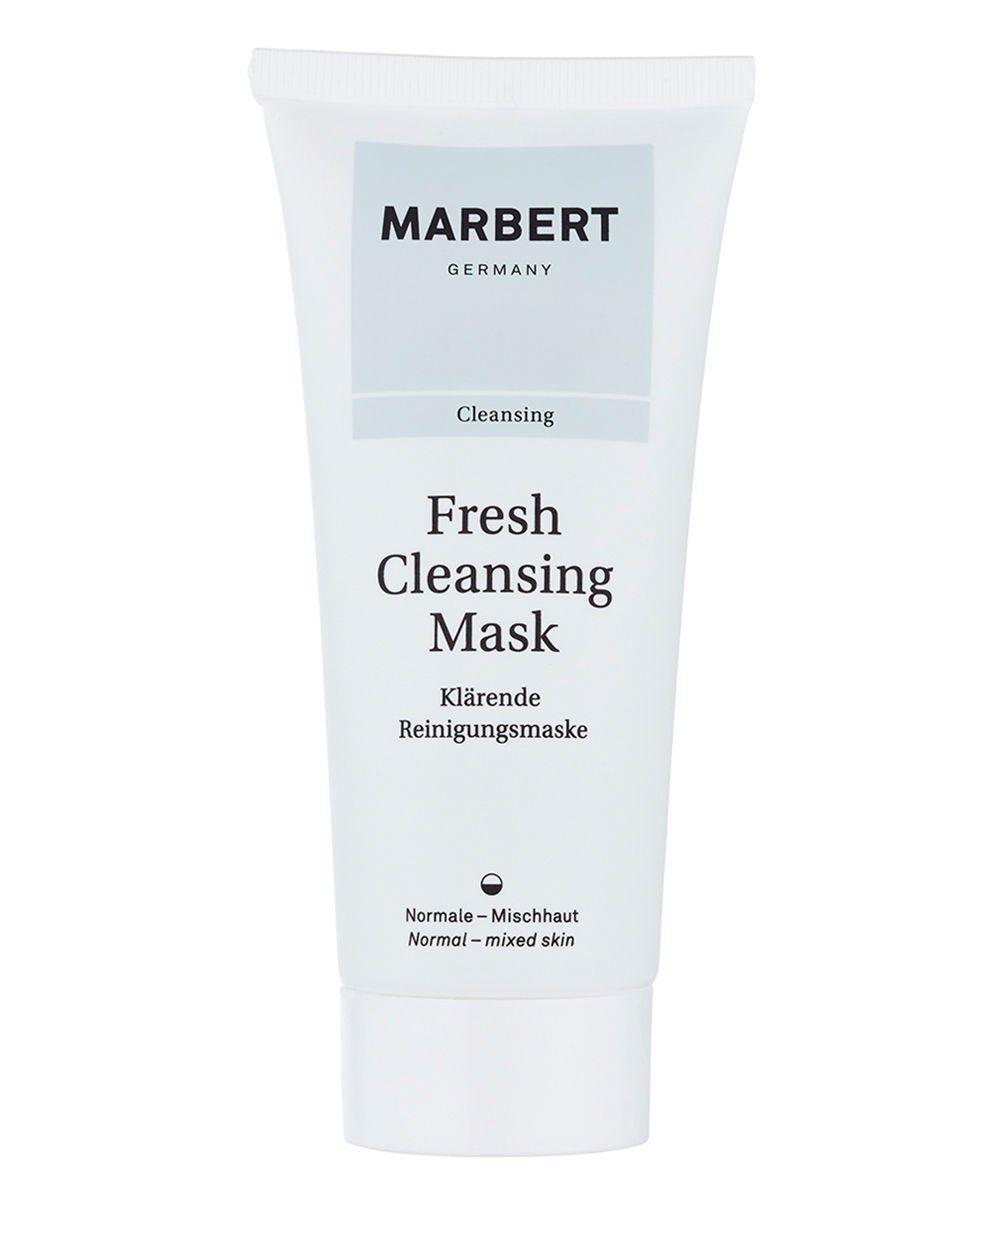 Marbert Gesichtsmaske »Fresh Cleansing Mask«